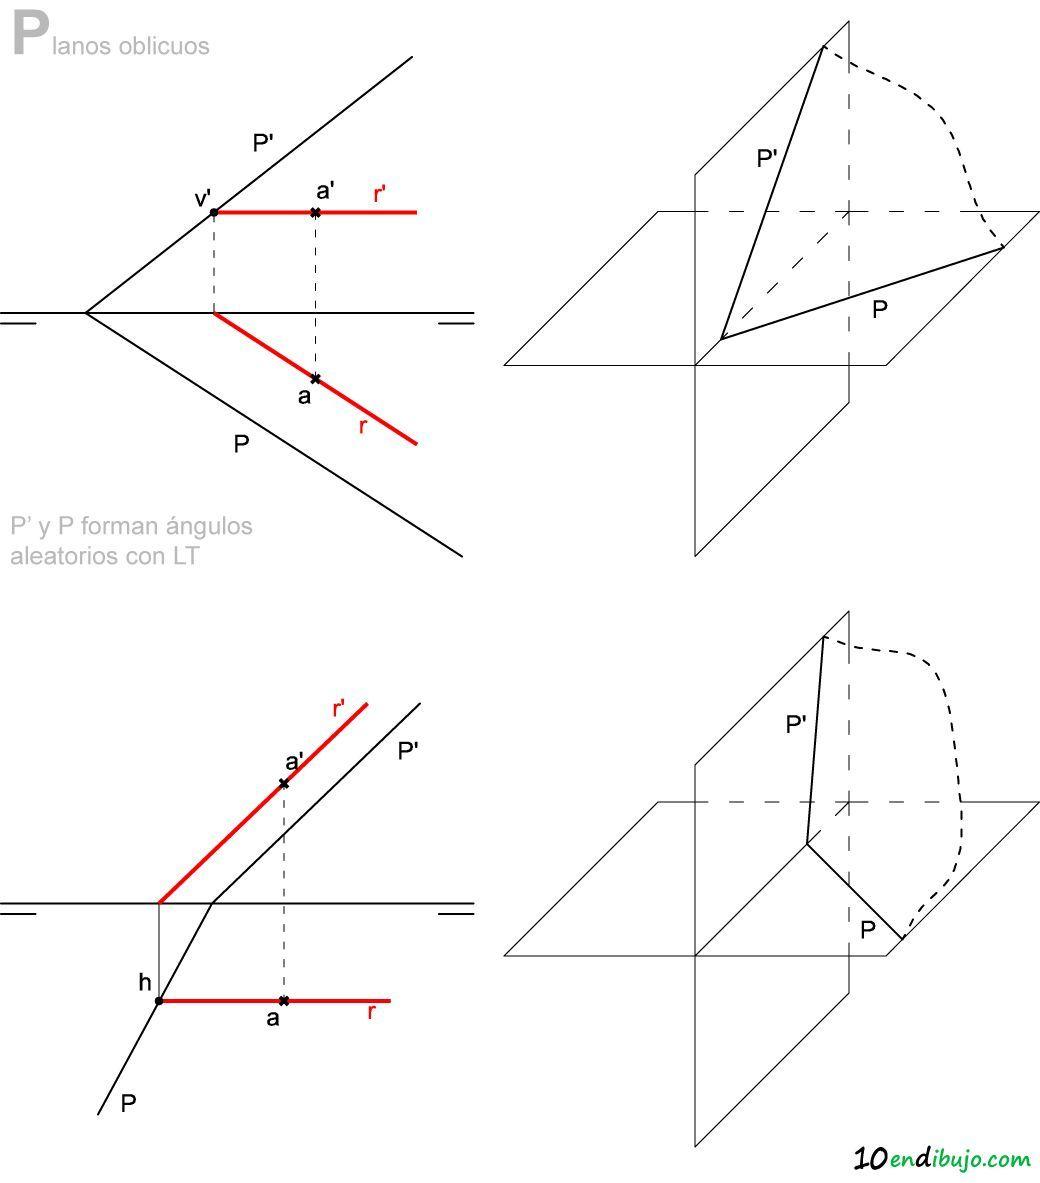 13 Plano En Diedrico Plano Oblicuo Tecnicas De Dibujo Clases De Dibujo Geometria Descriptiva